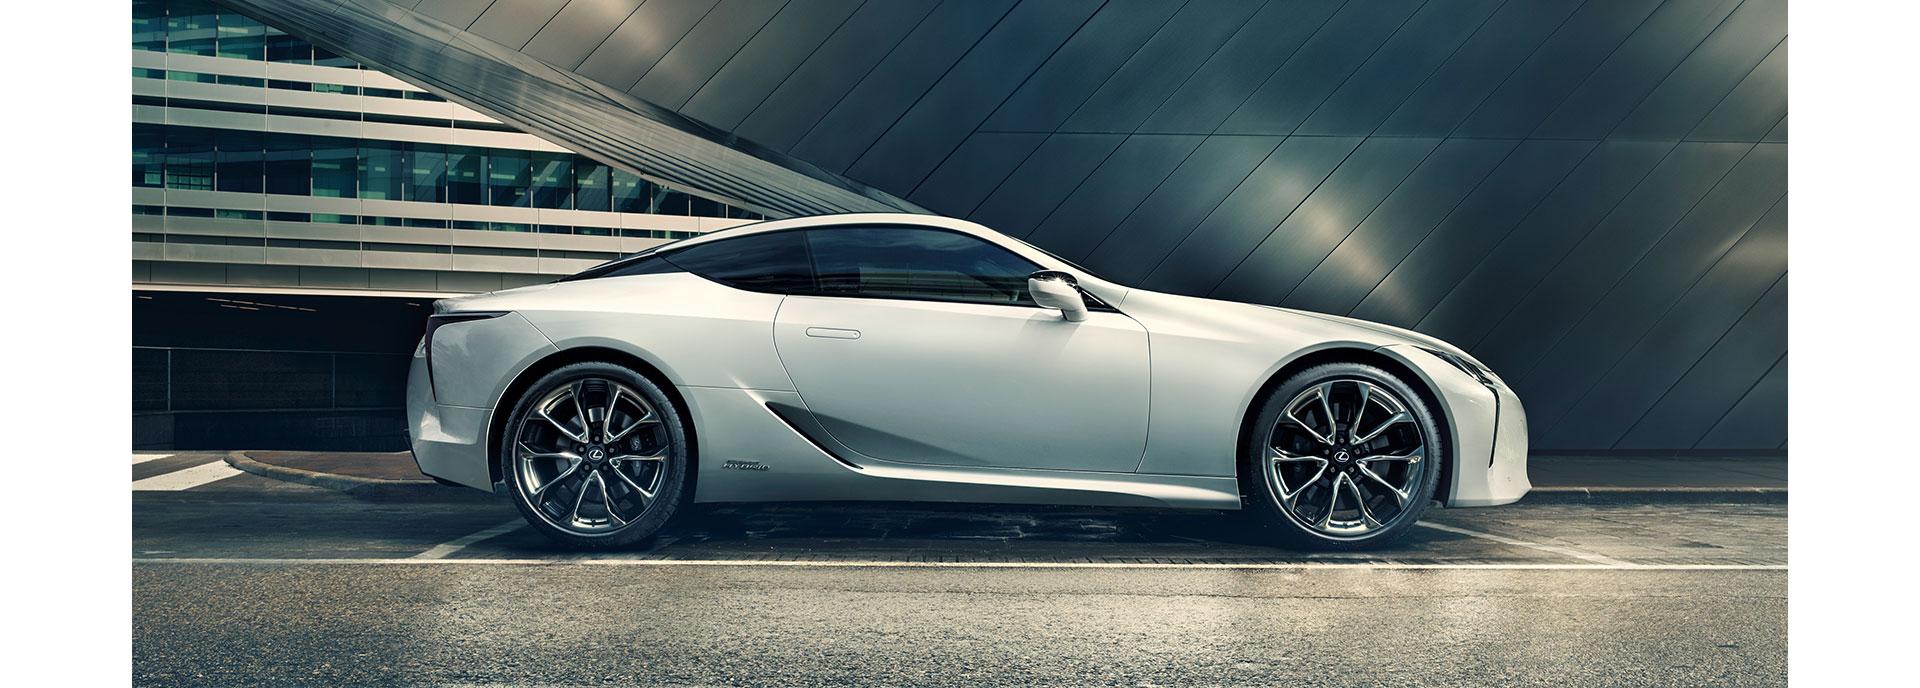 2017 Lexus LC Unmistakable Profile